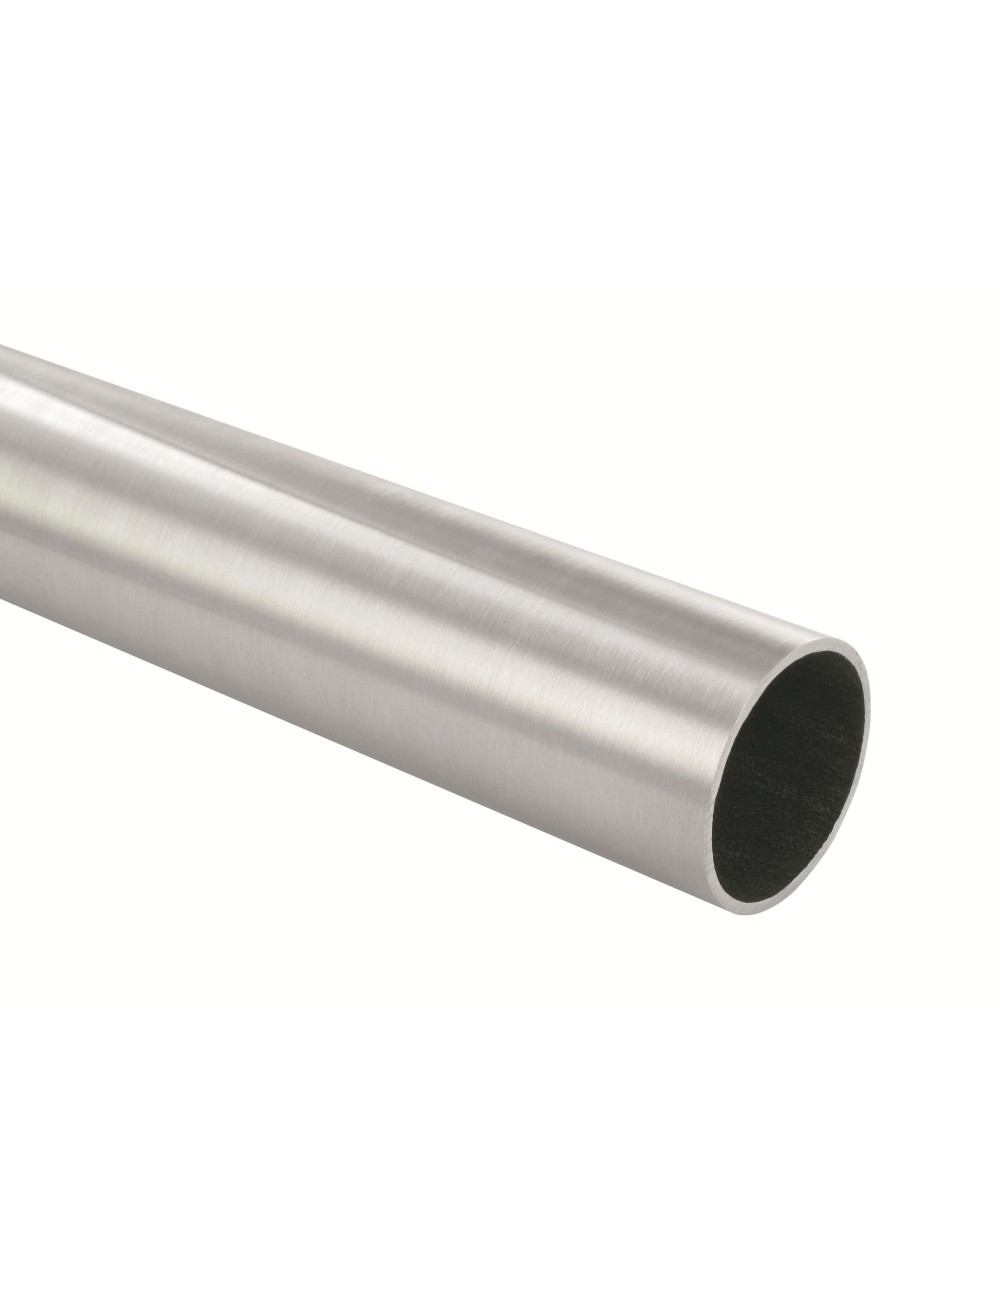 Tubo tondo in acciaio inox